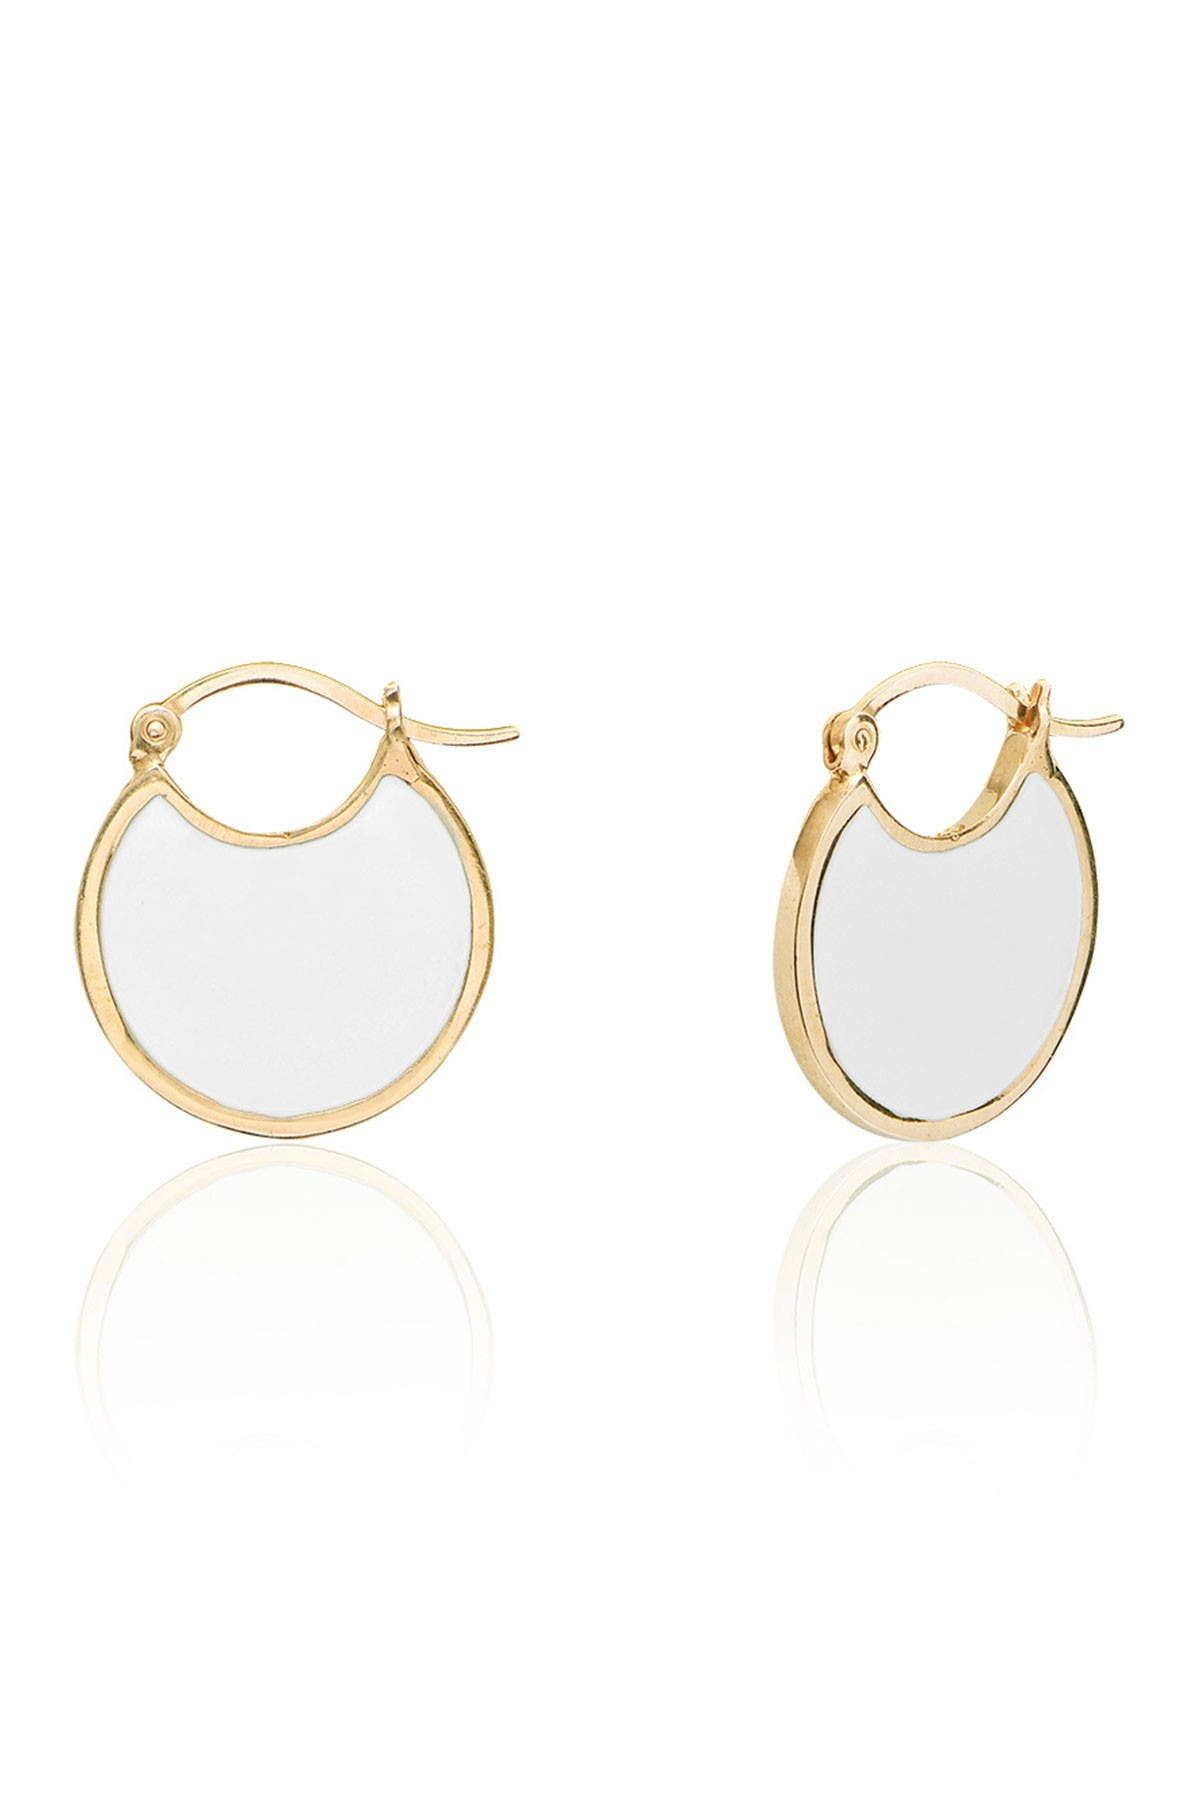 Gold vermeil disc earrings